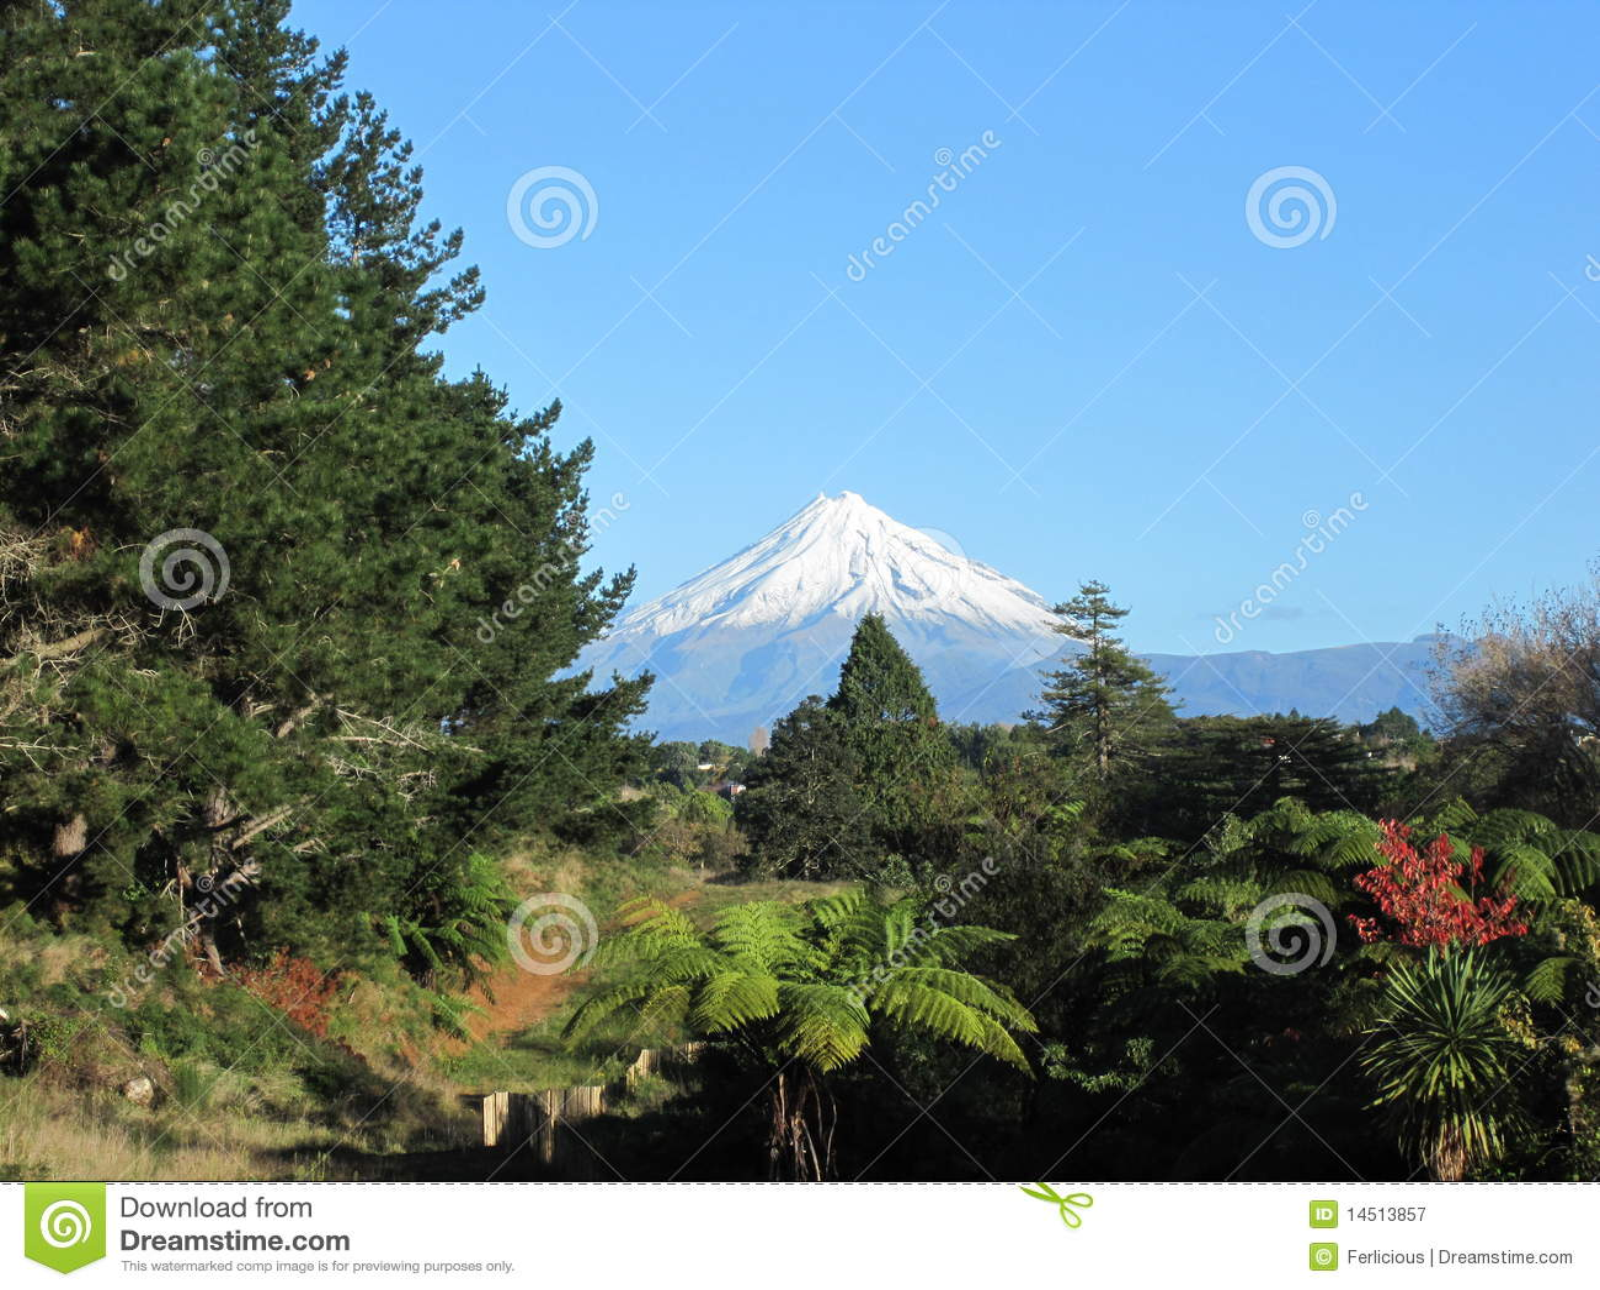 Mount Taranaki New Zealand  city photo : Mount Taranaki, New Zealand Royalty Free Stock Photography Image ...